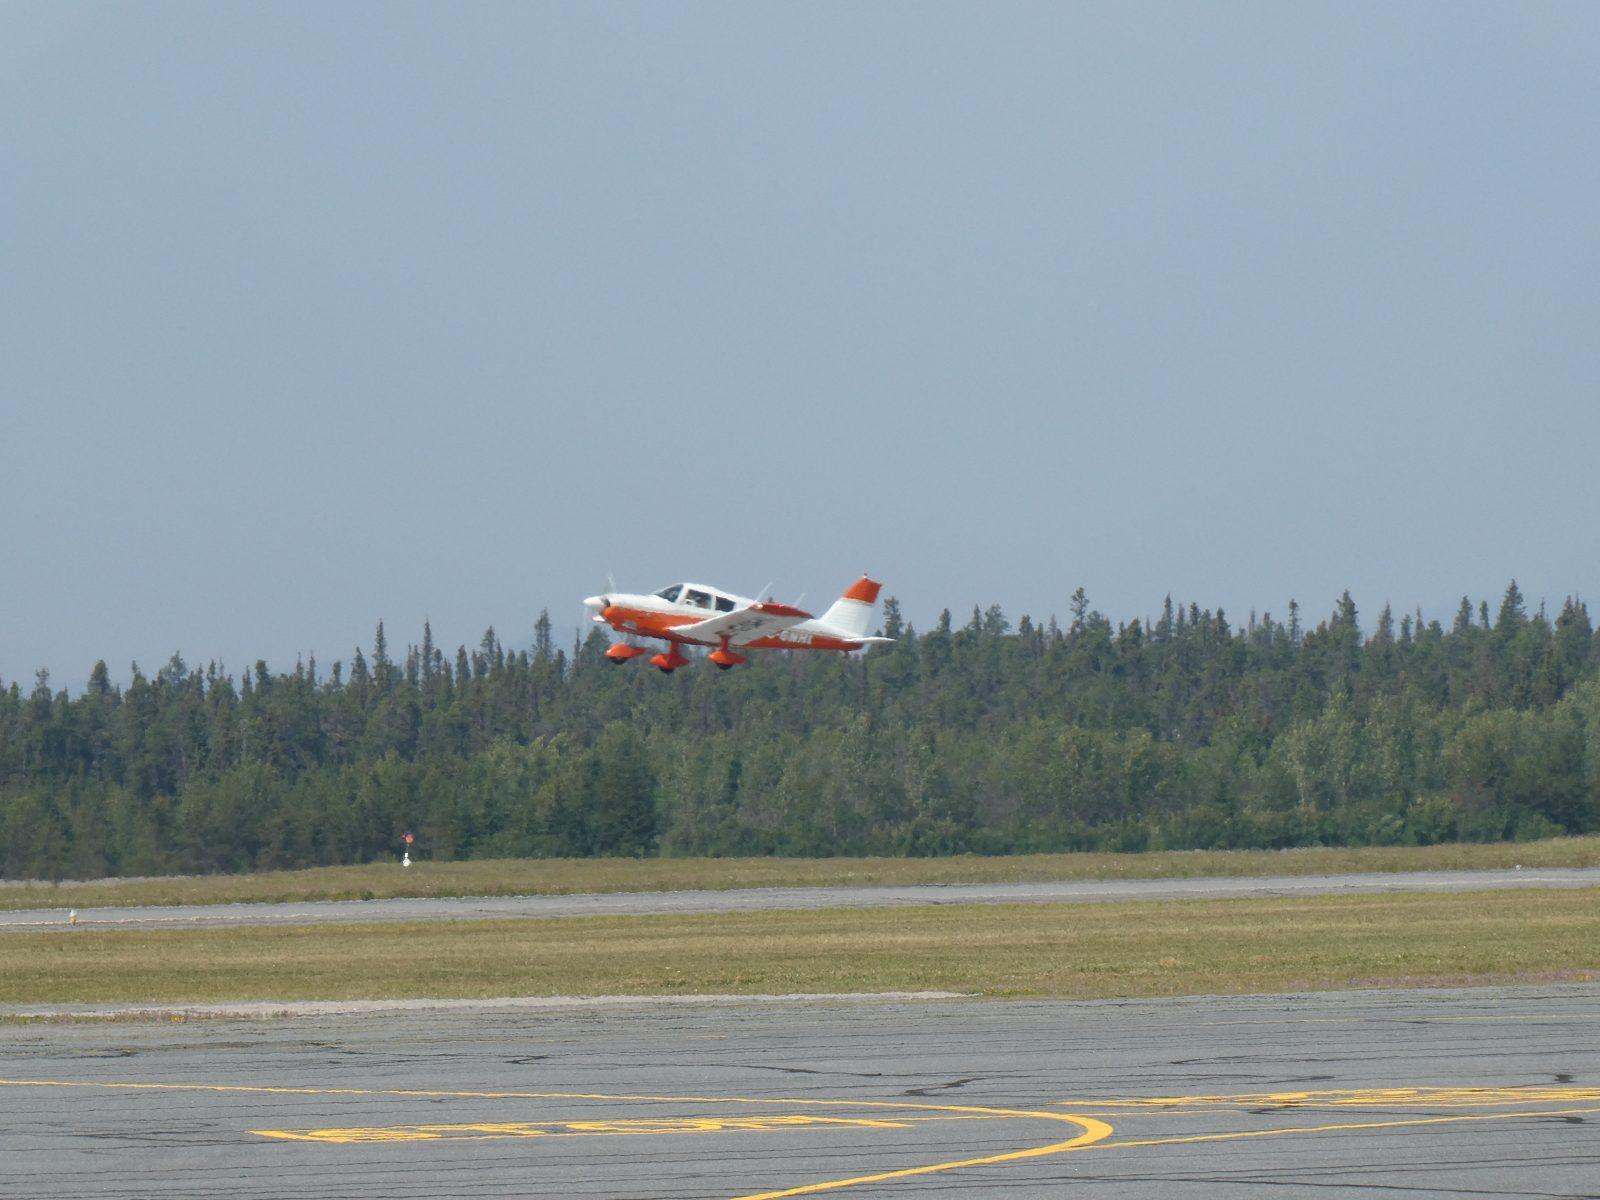 Transports Canada repavera la piste principale de l'aéroport de Sept-Îles